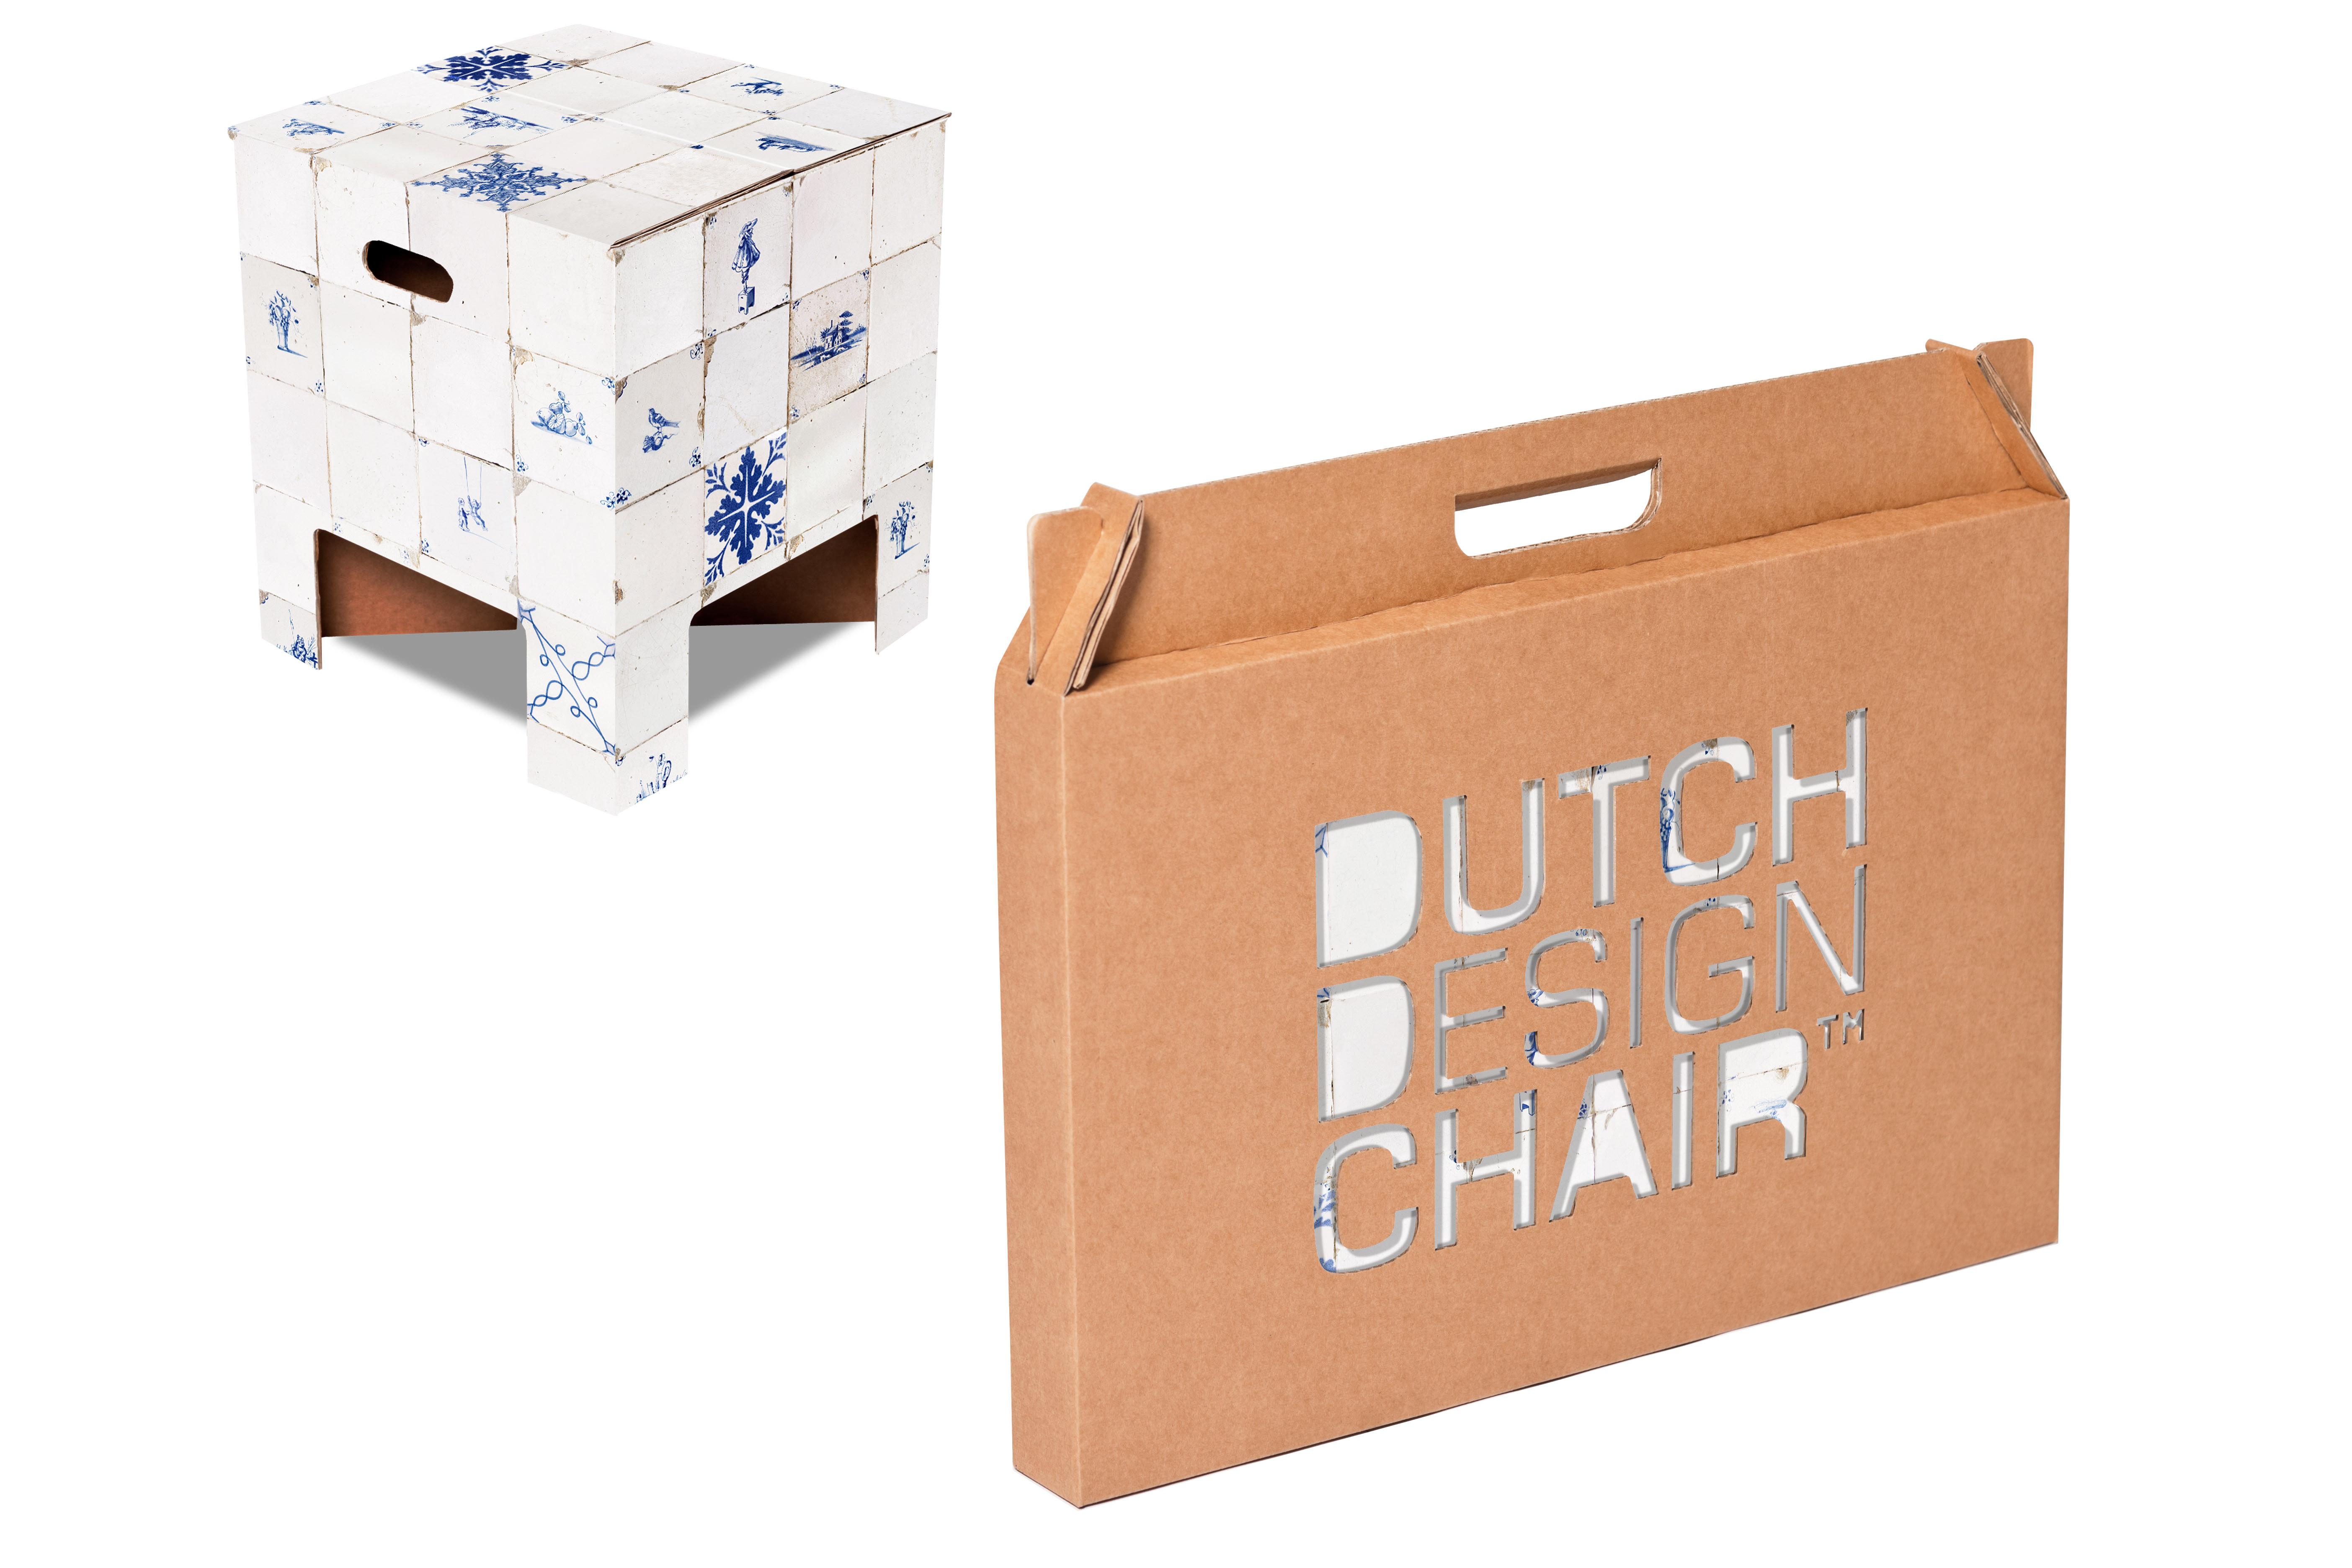 Dutch Design Chair concrete Dutch Design Chair With Tile Motif And Packaging Of Dutch Design Brand